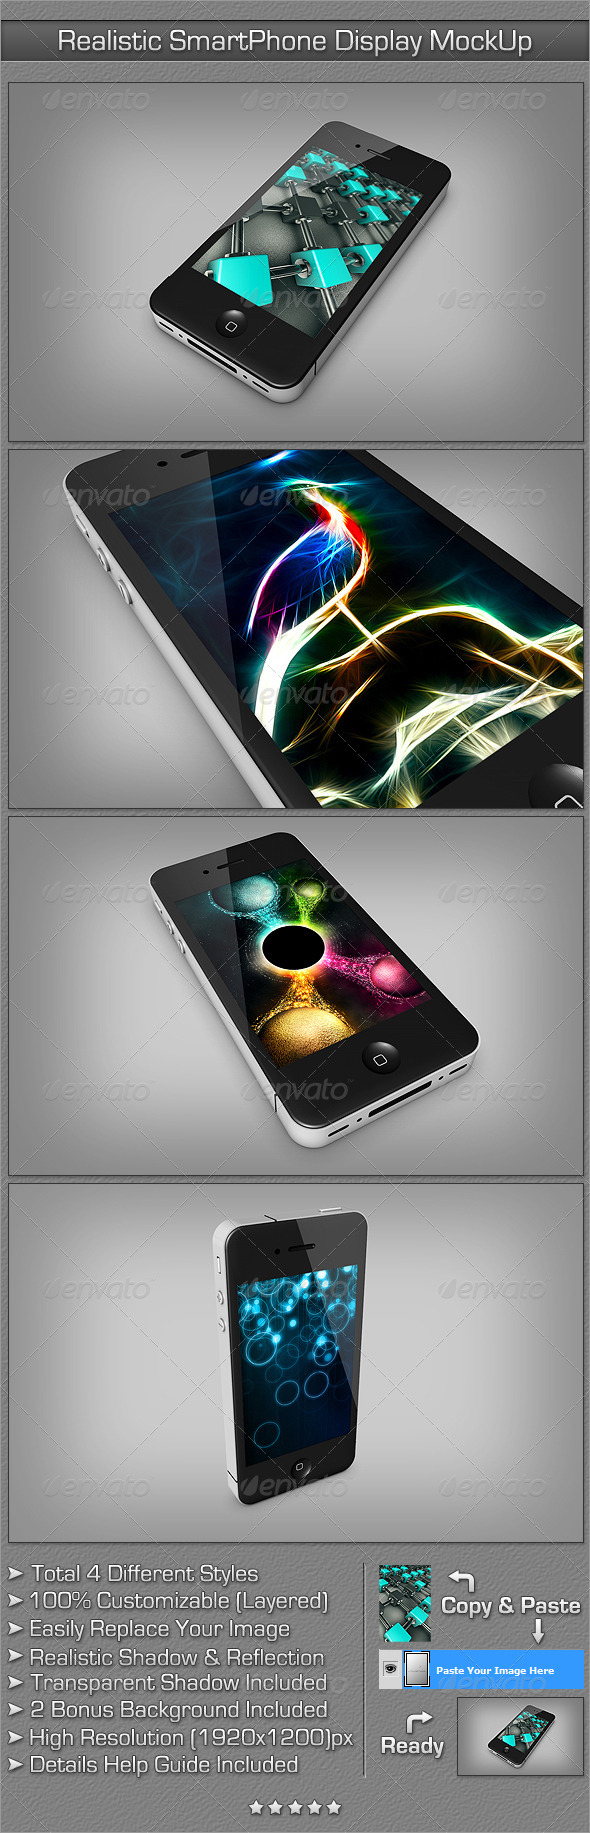 Realistic SmartPhone Display MockUp - Mobile Displays